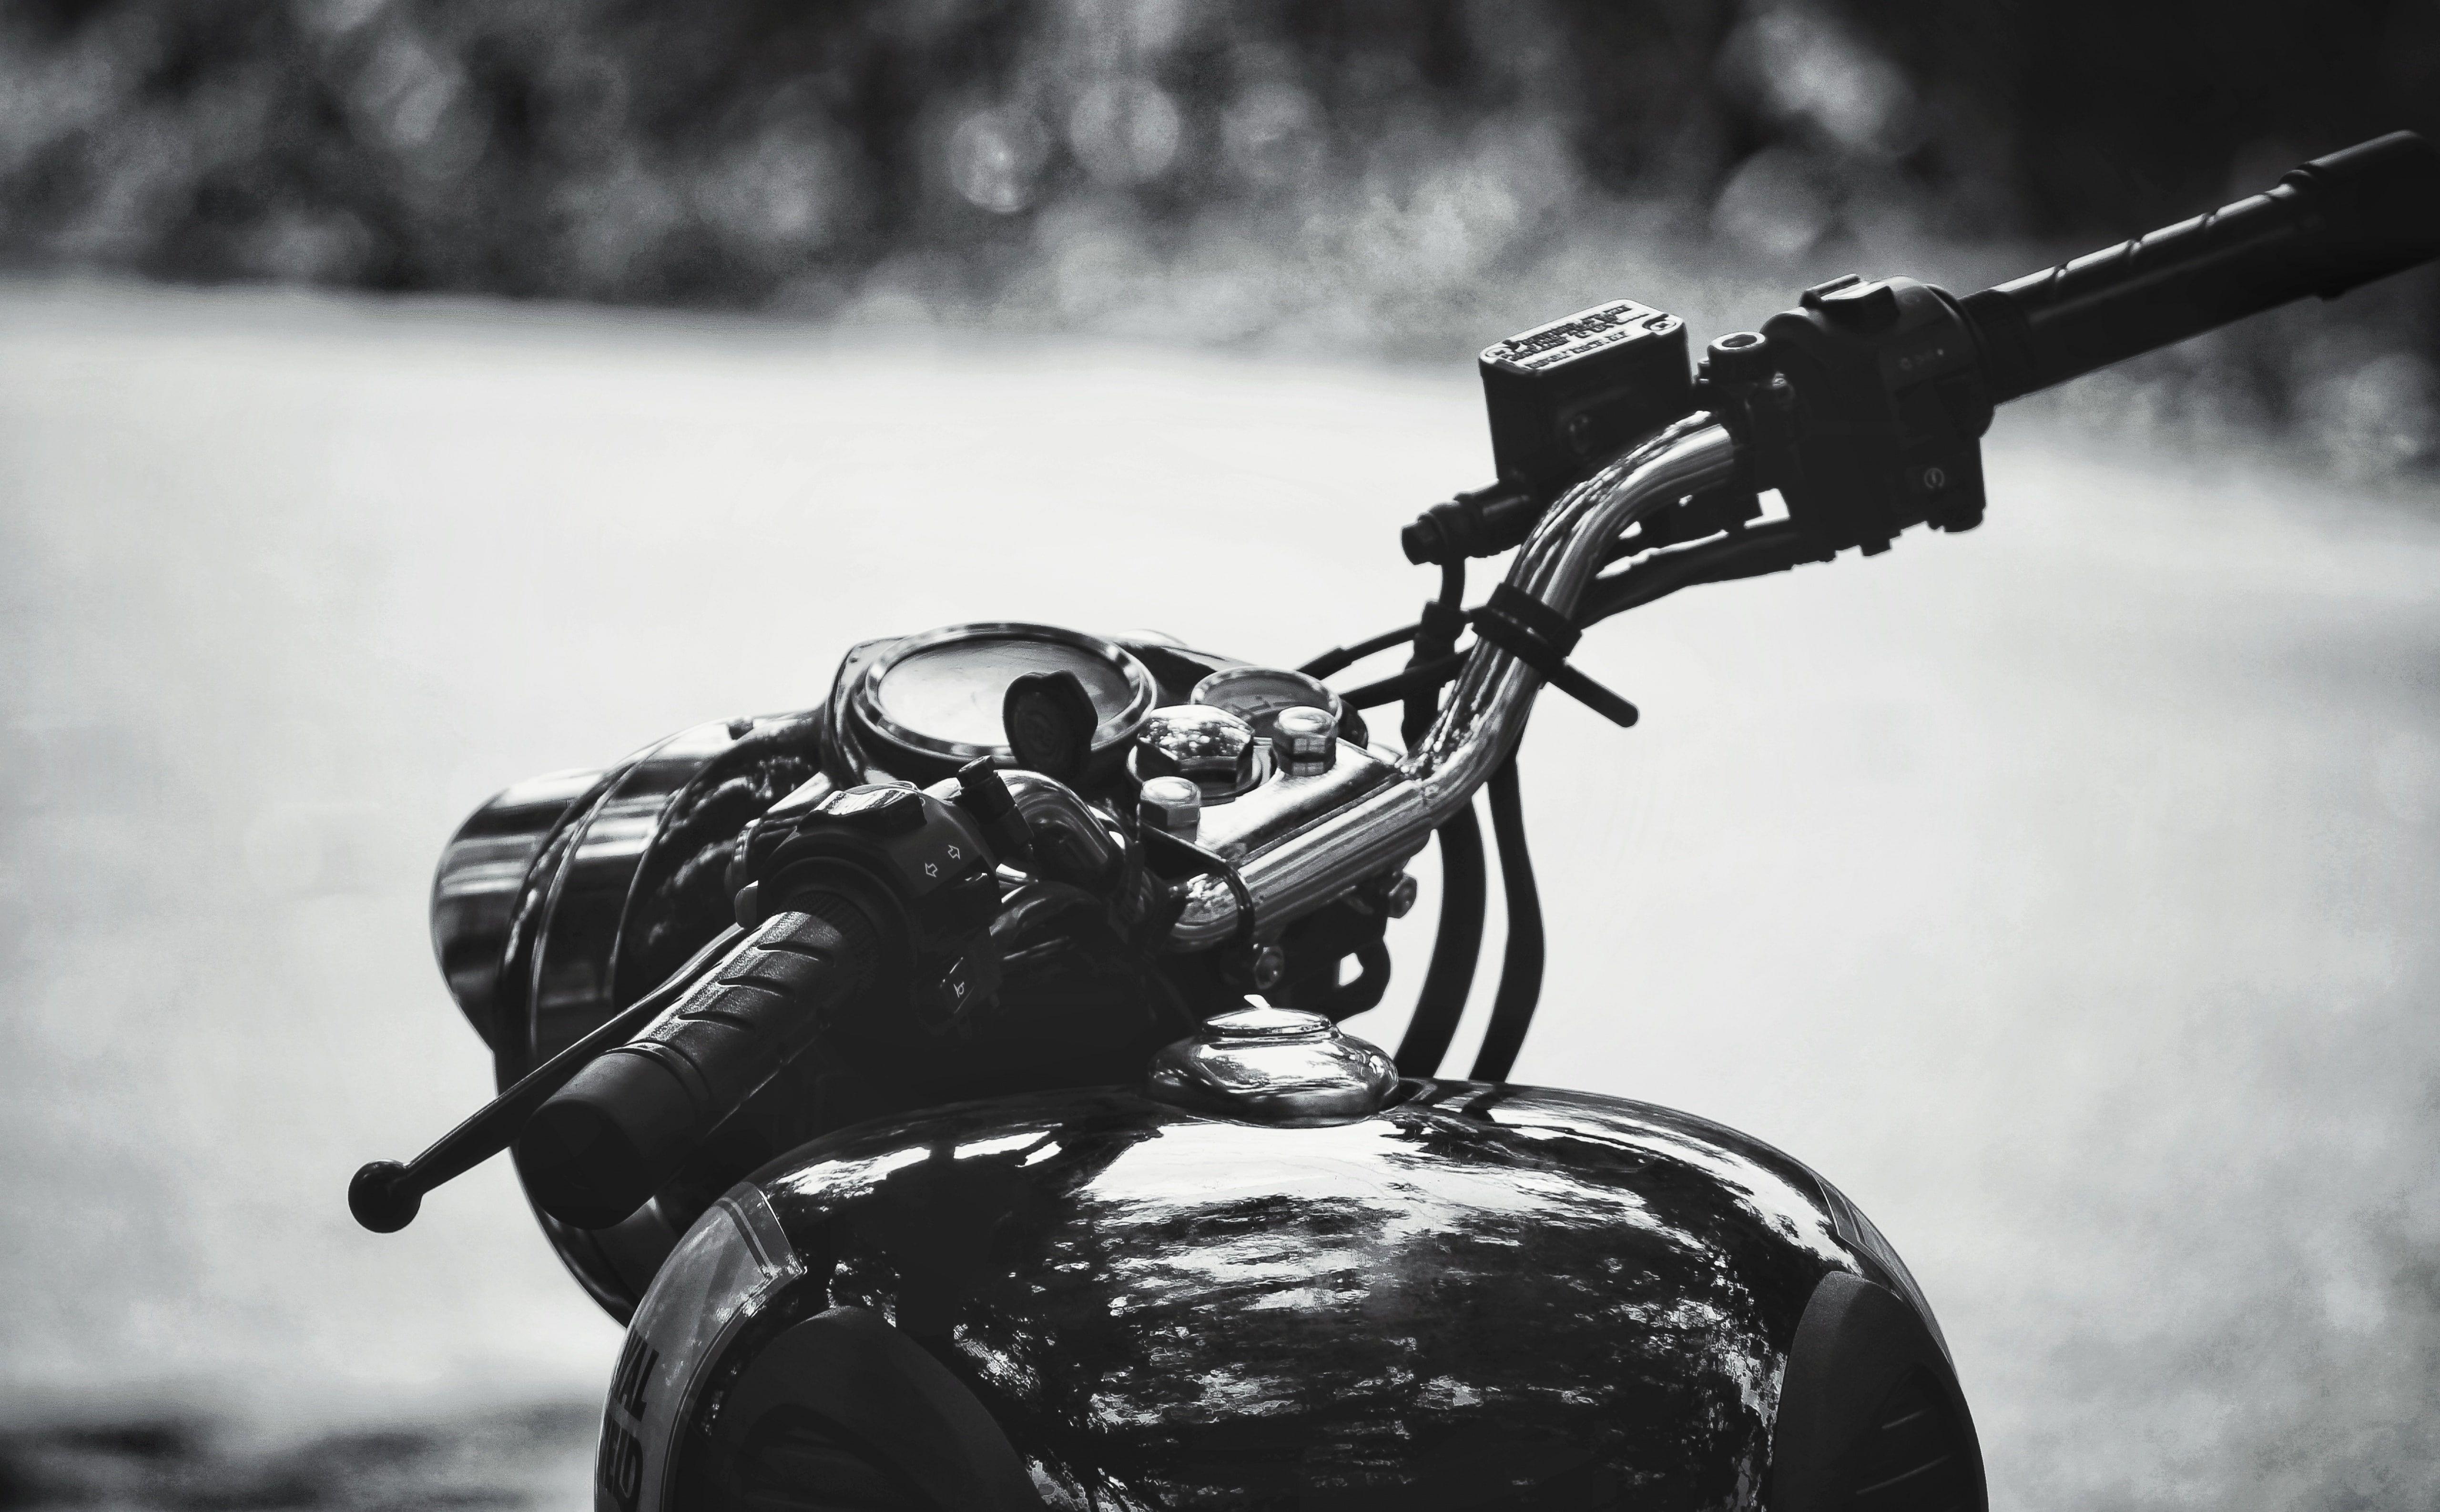 Royal Enfield Motorcycle Handle Black And White Blackandwhite